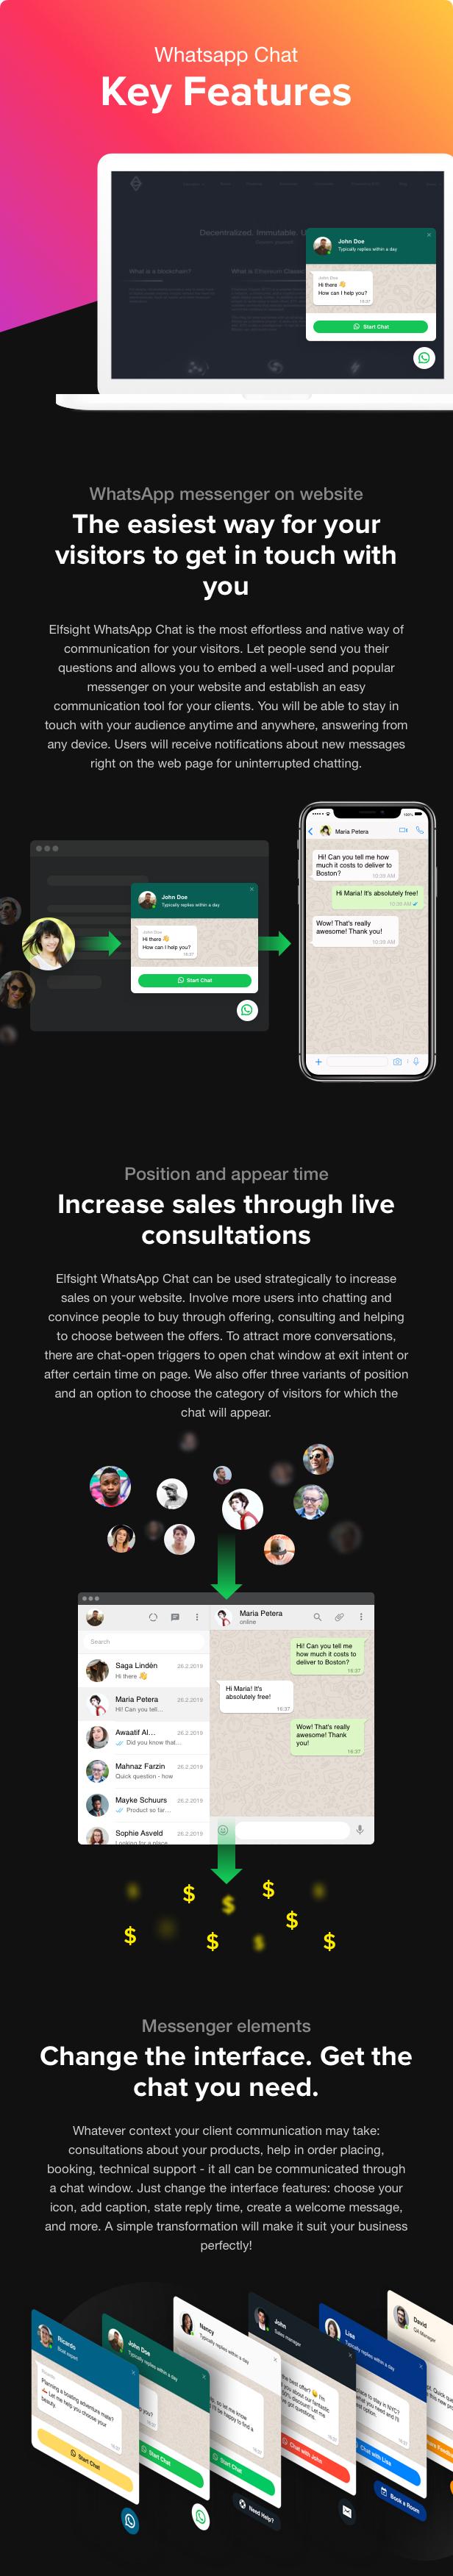 WhatsApp Chat - WordPress WhatsApp Chat plugin - 1